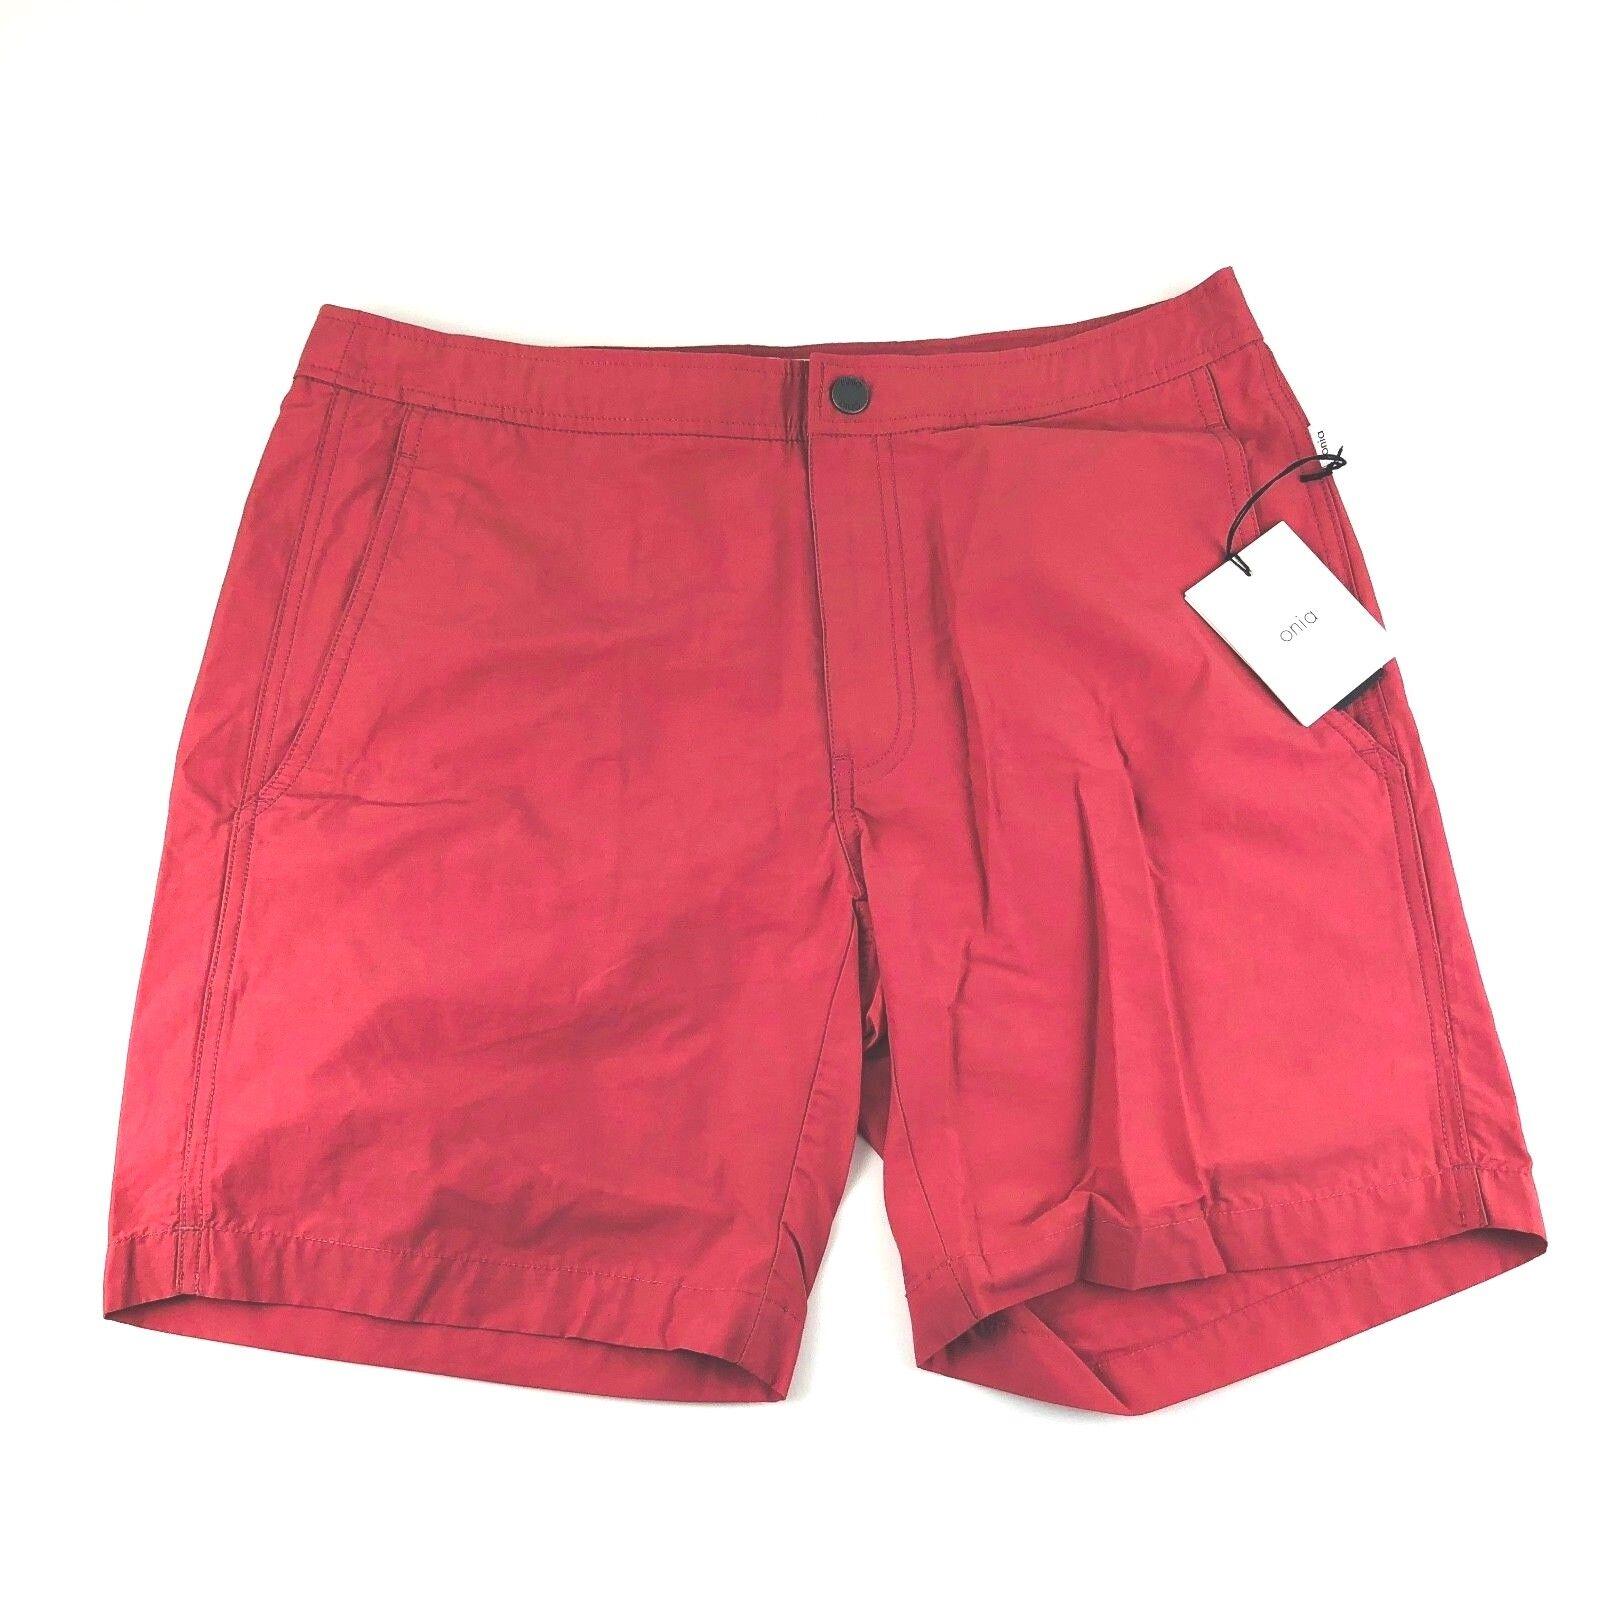 a7d9a20940 Onia Calder Terracotta Swim Trunks 7.5 Inch Shorts Mens Size 32 36 38 NWT